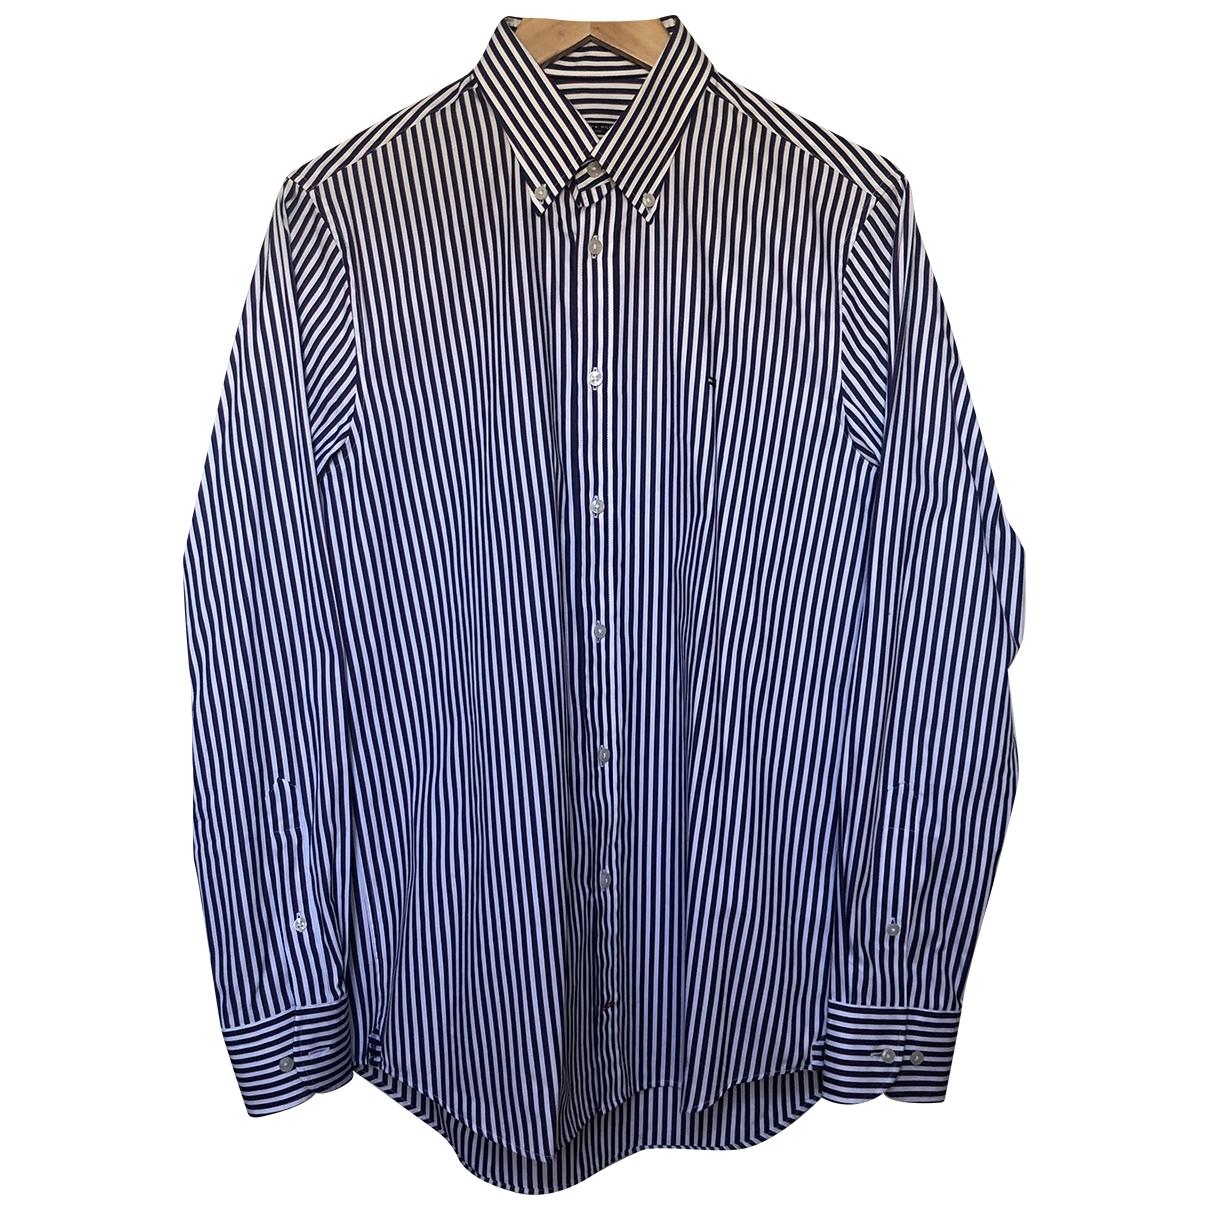 Tommy Hilfiger \N White Cotton Shirts for Men M International